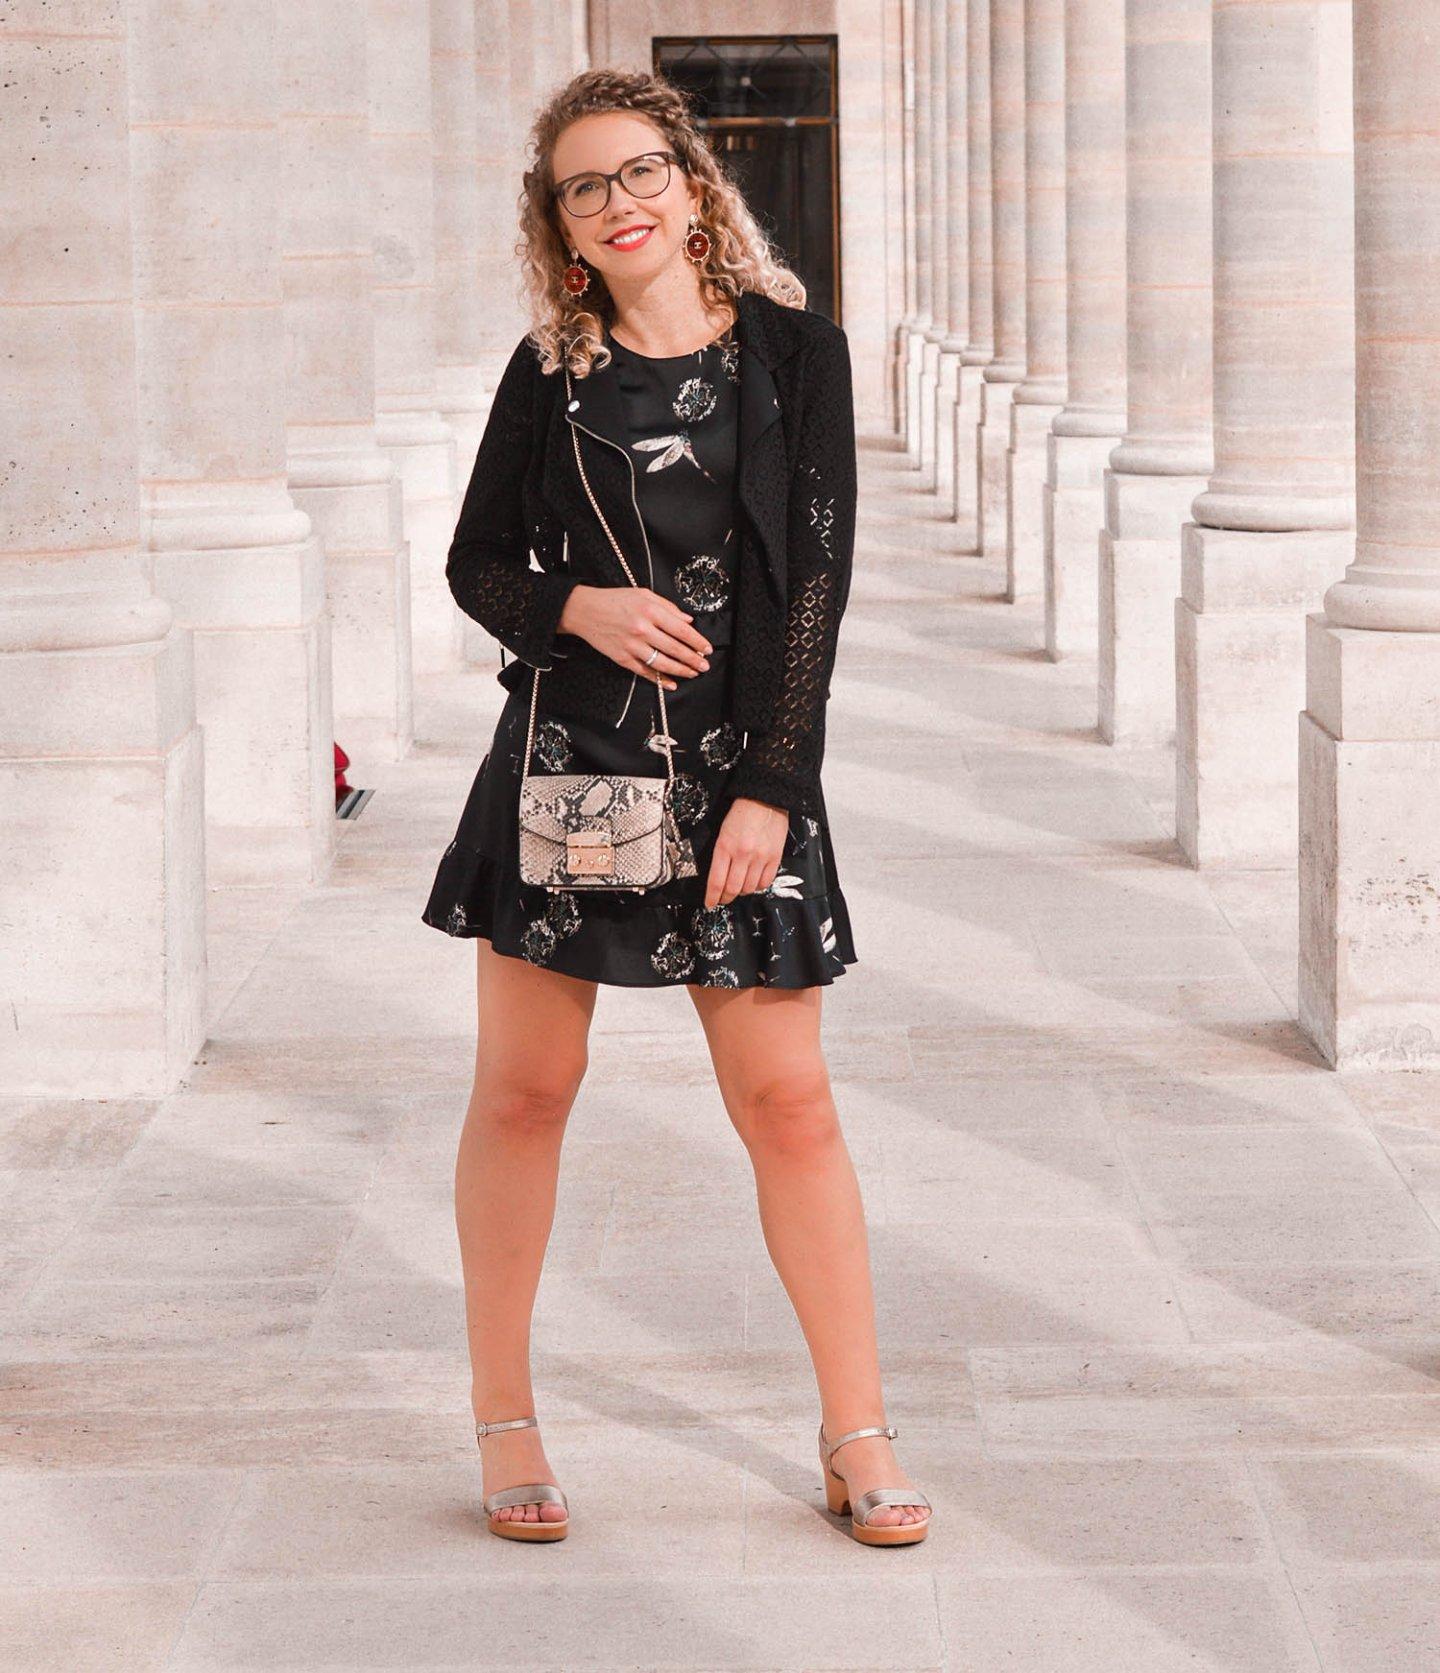 elegantes outfit in schwarz